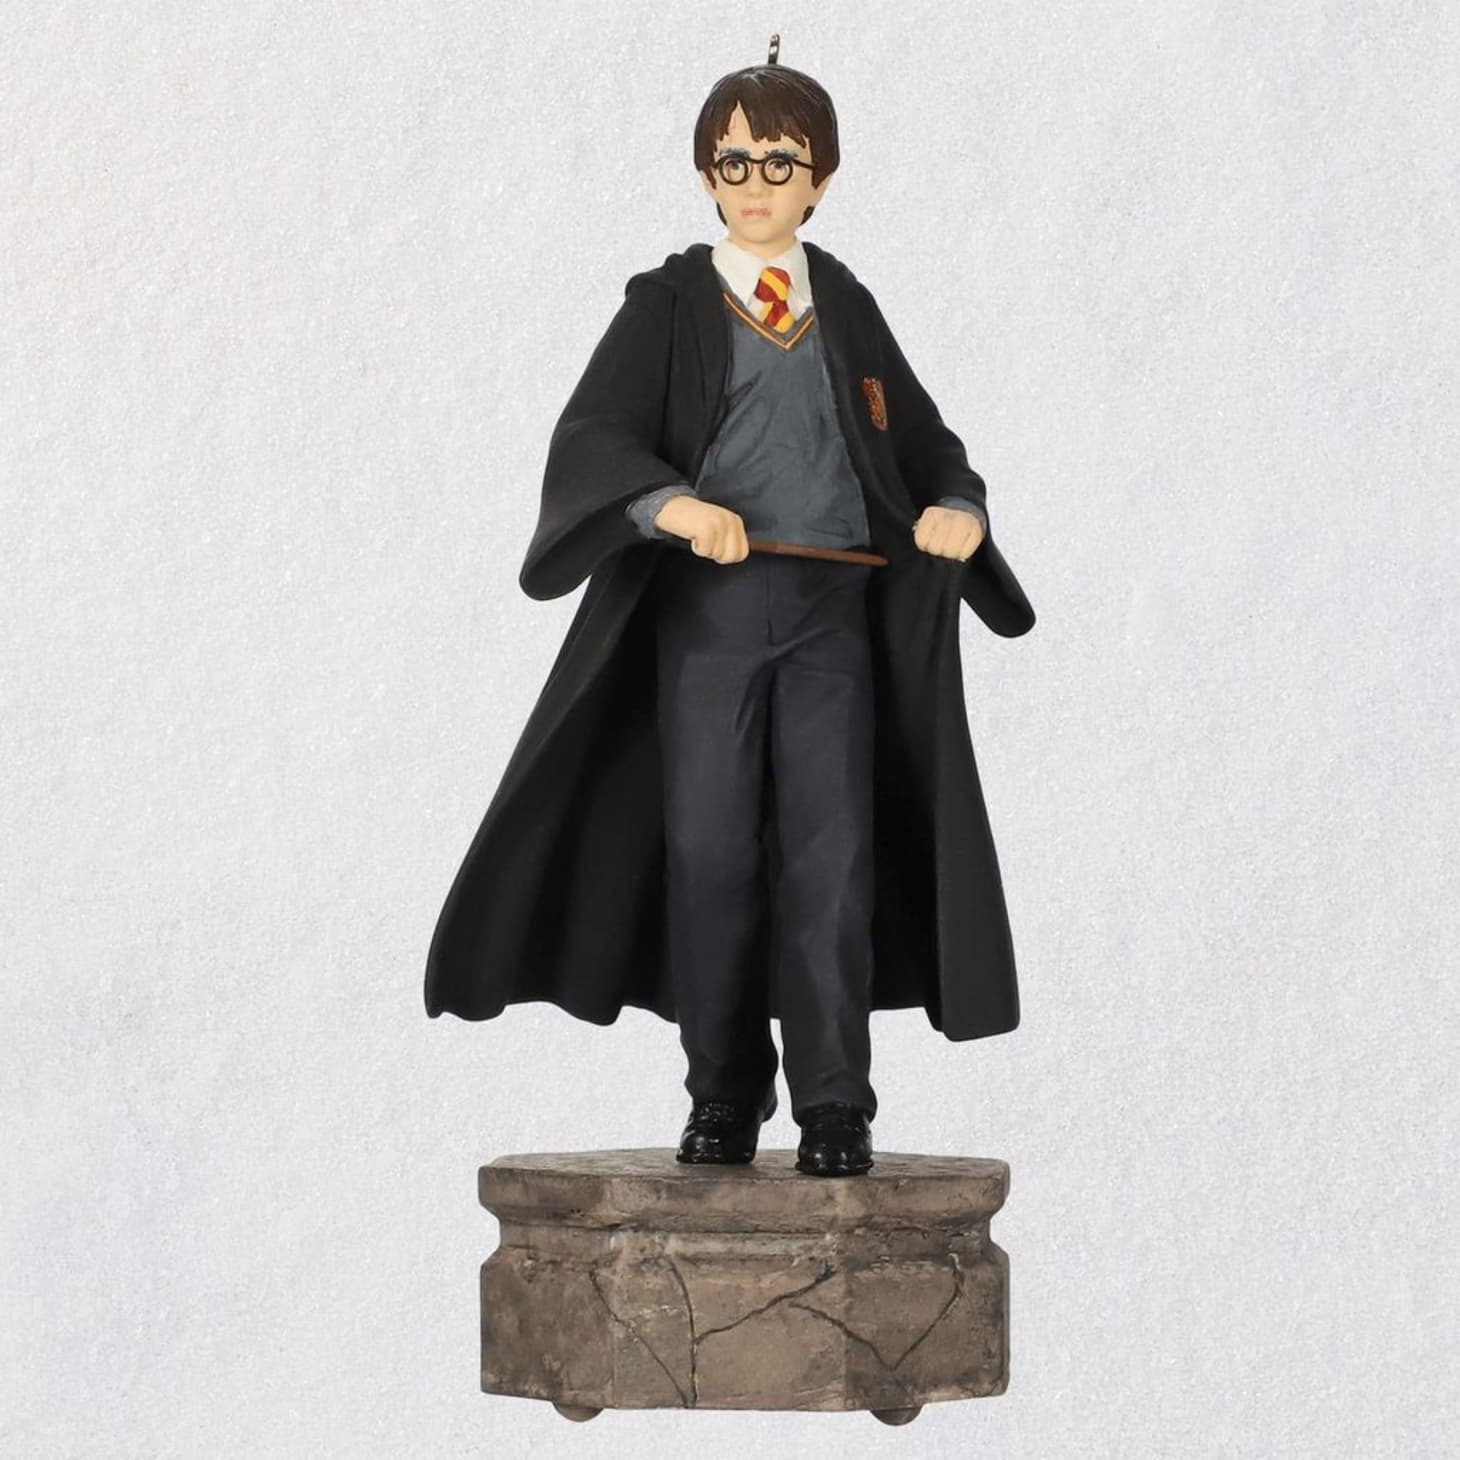 Harry Potter Christmas Tree Topper: Musical Harry Potter Christmas Tree Topper